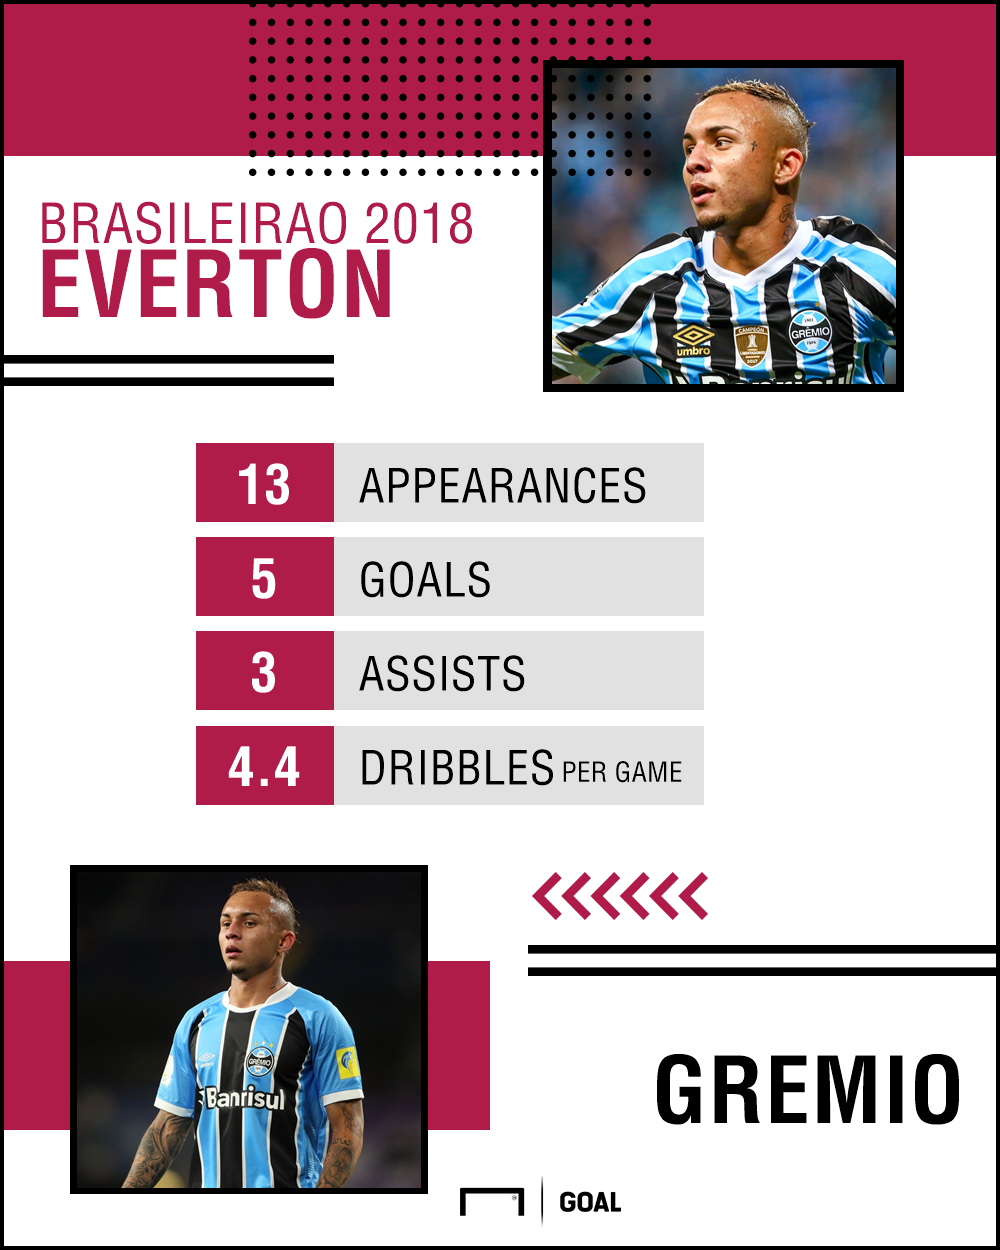 Everton Gremio GFX 13082018